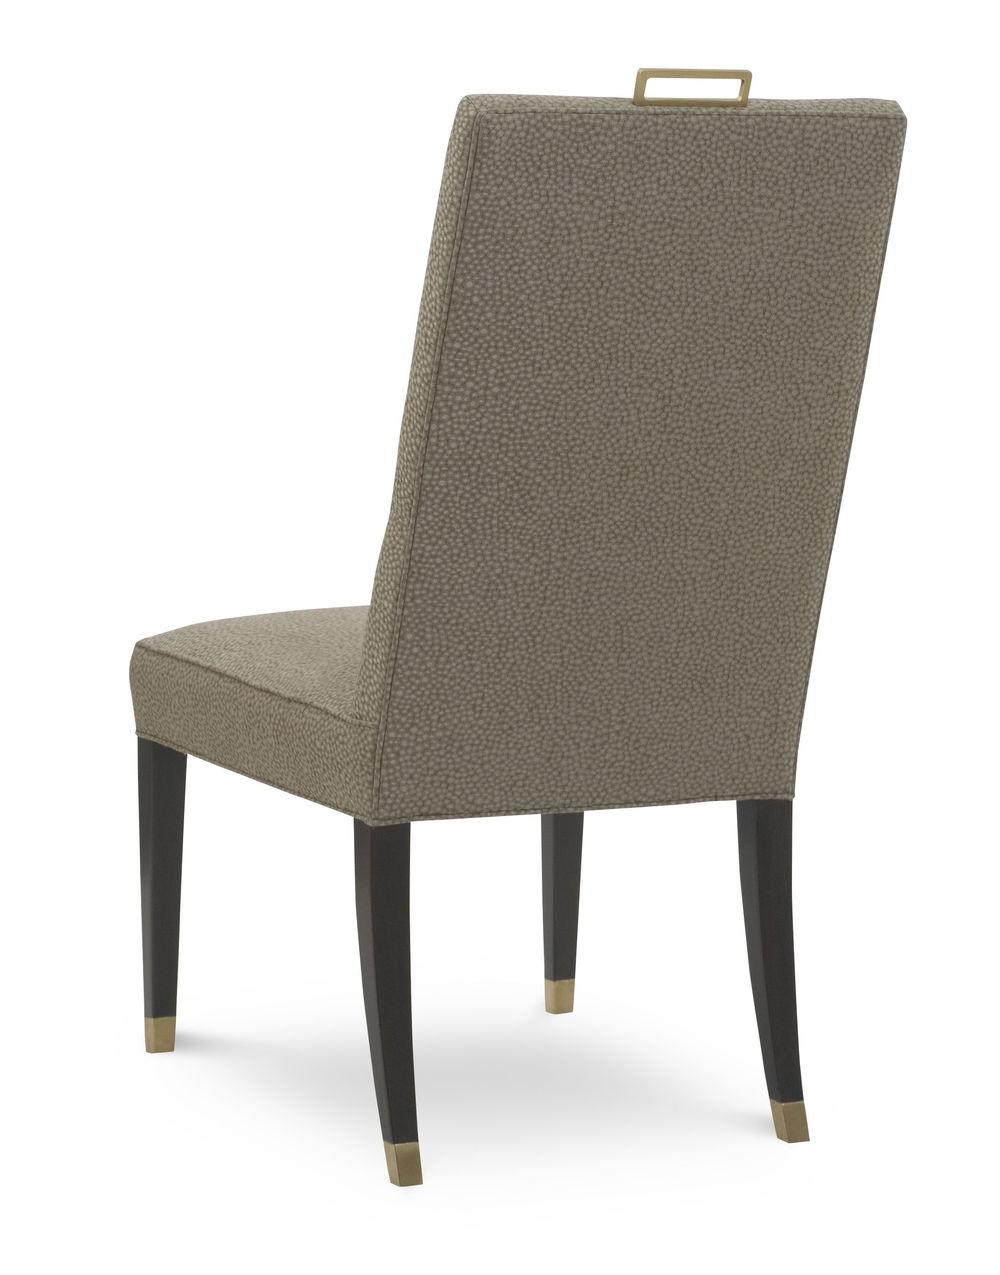 Chaddock - Tuxedo Side Chair